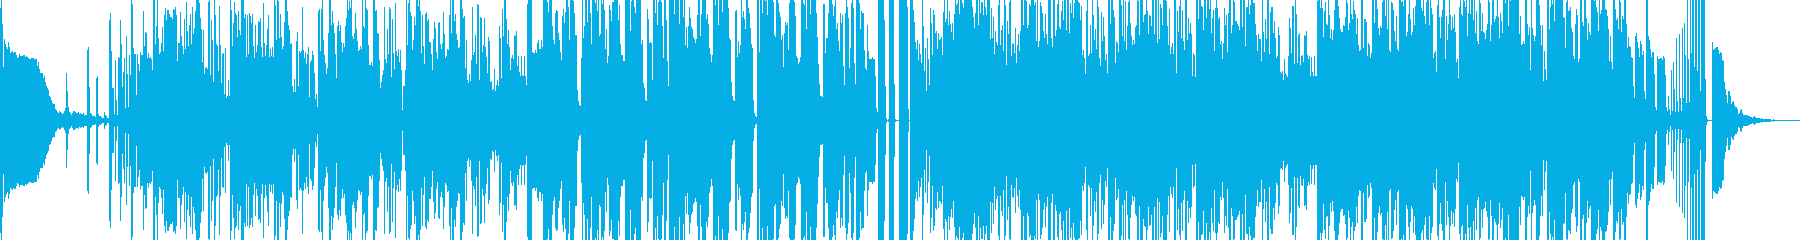 【CM】アブストラクトで、エネルギッシュの再生済みの波形